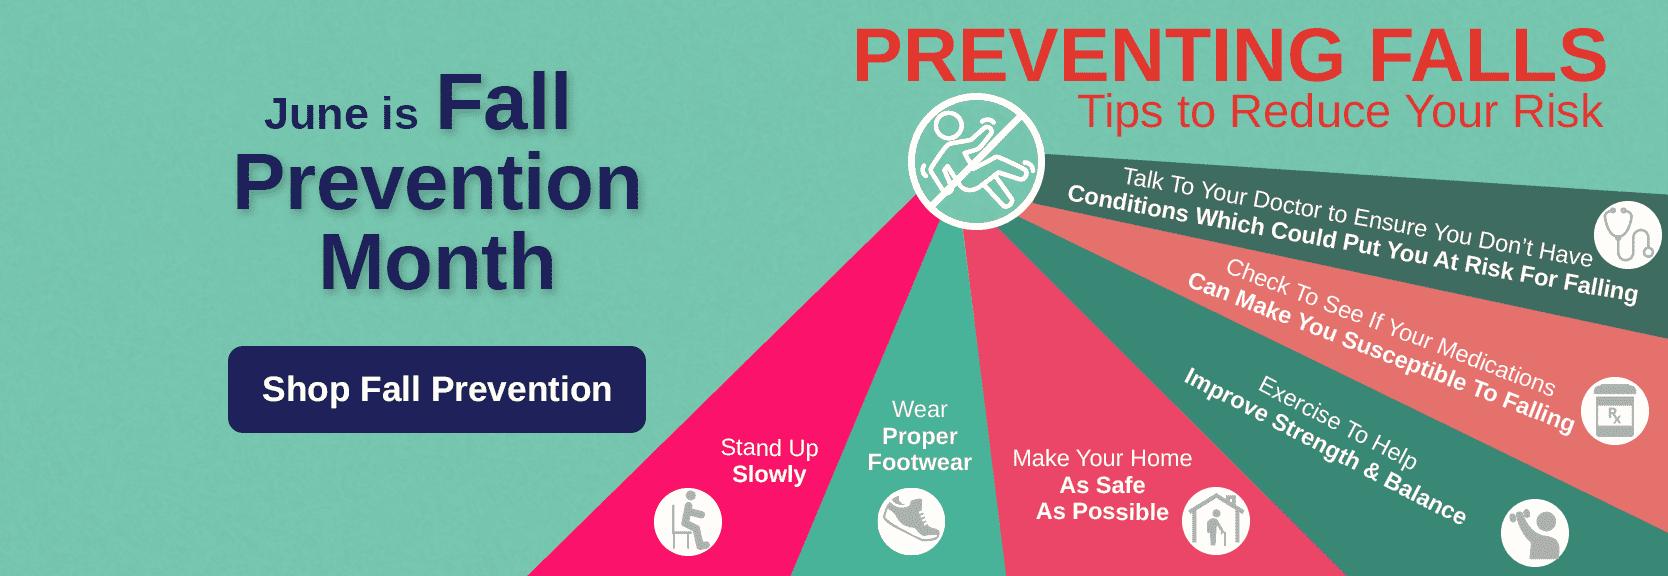 Shop Fall Prevention